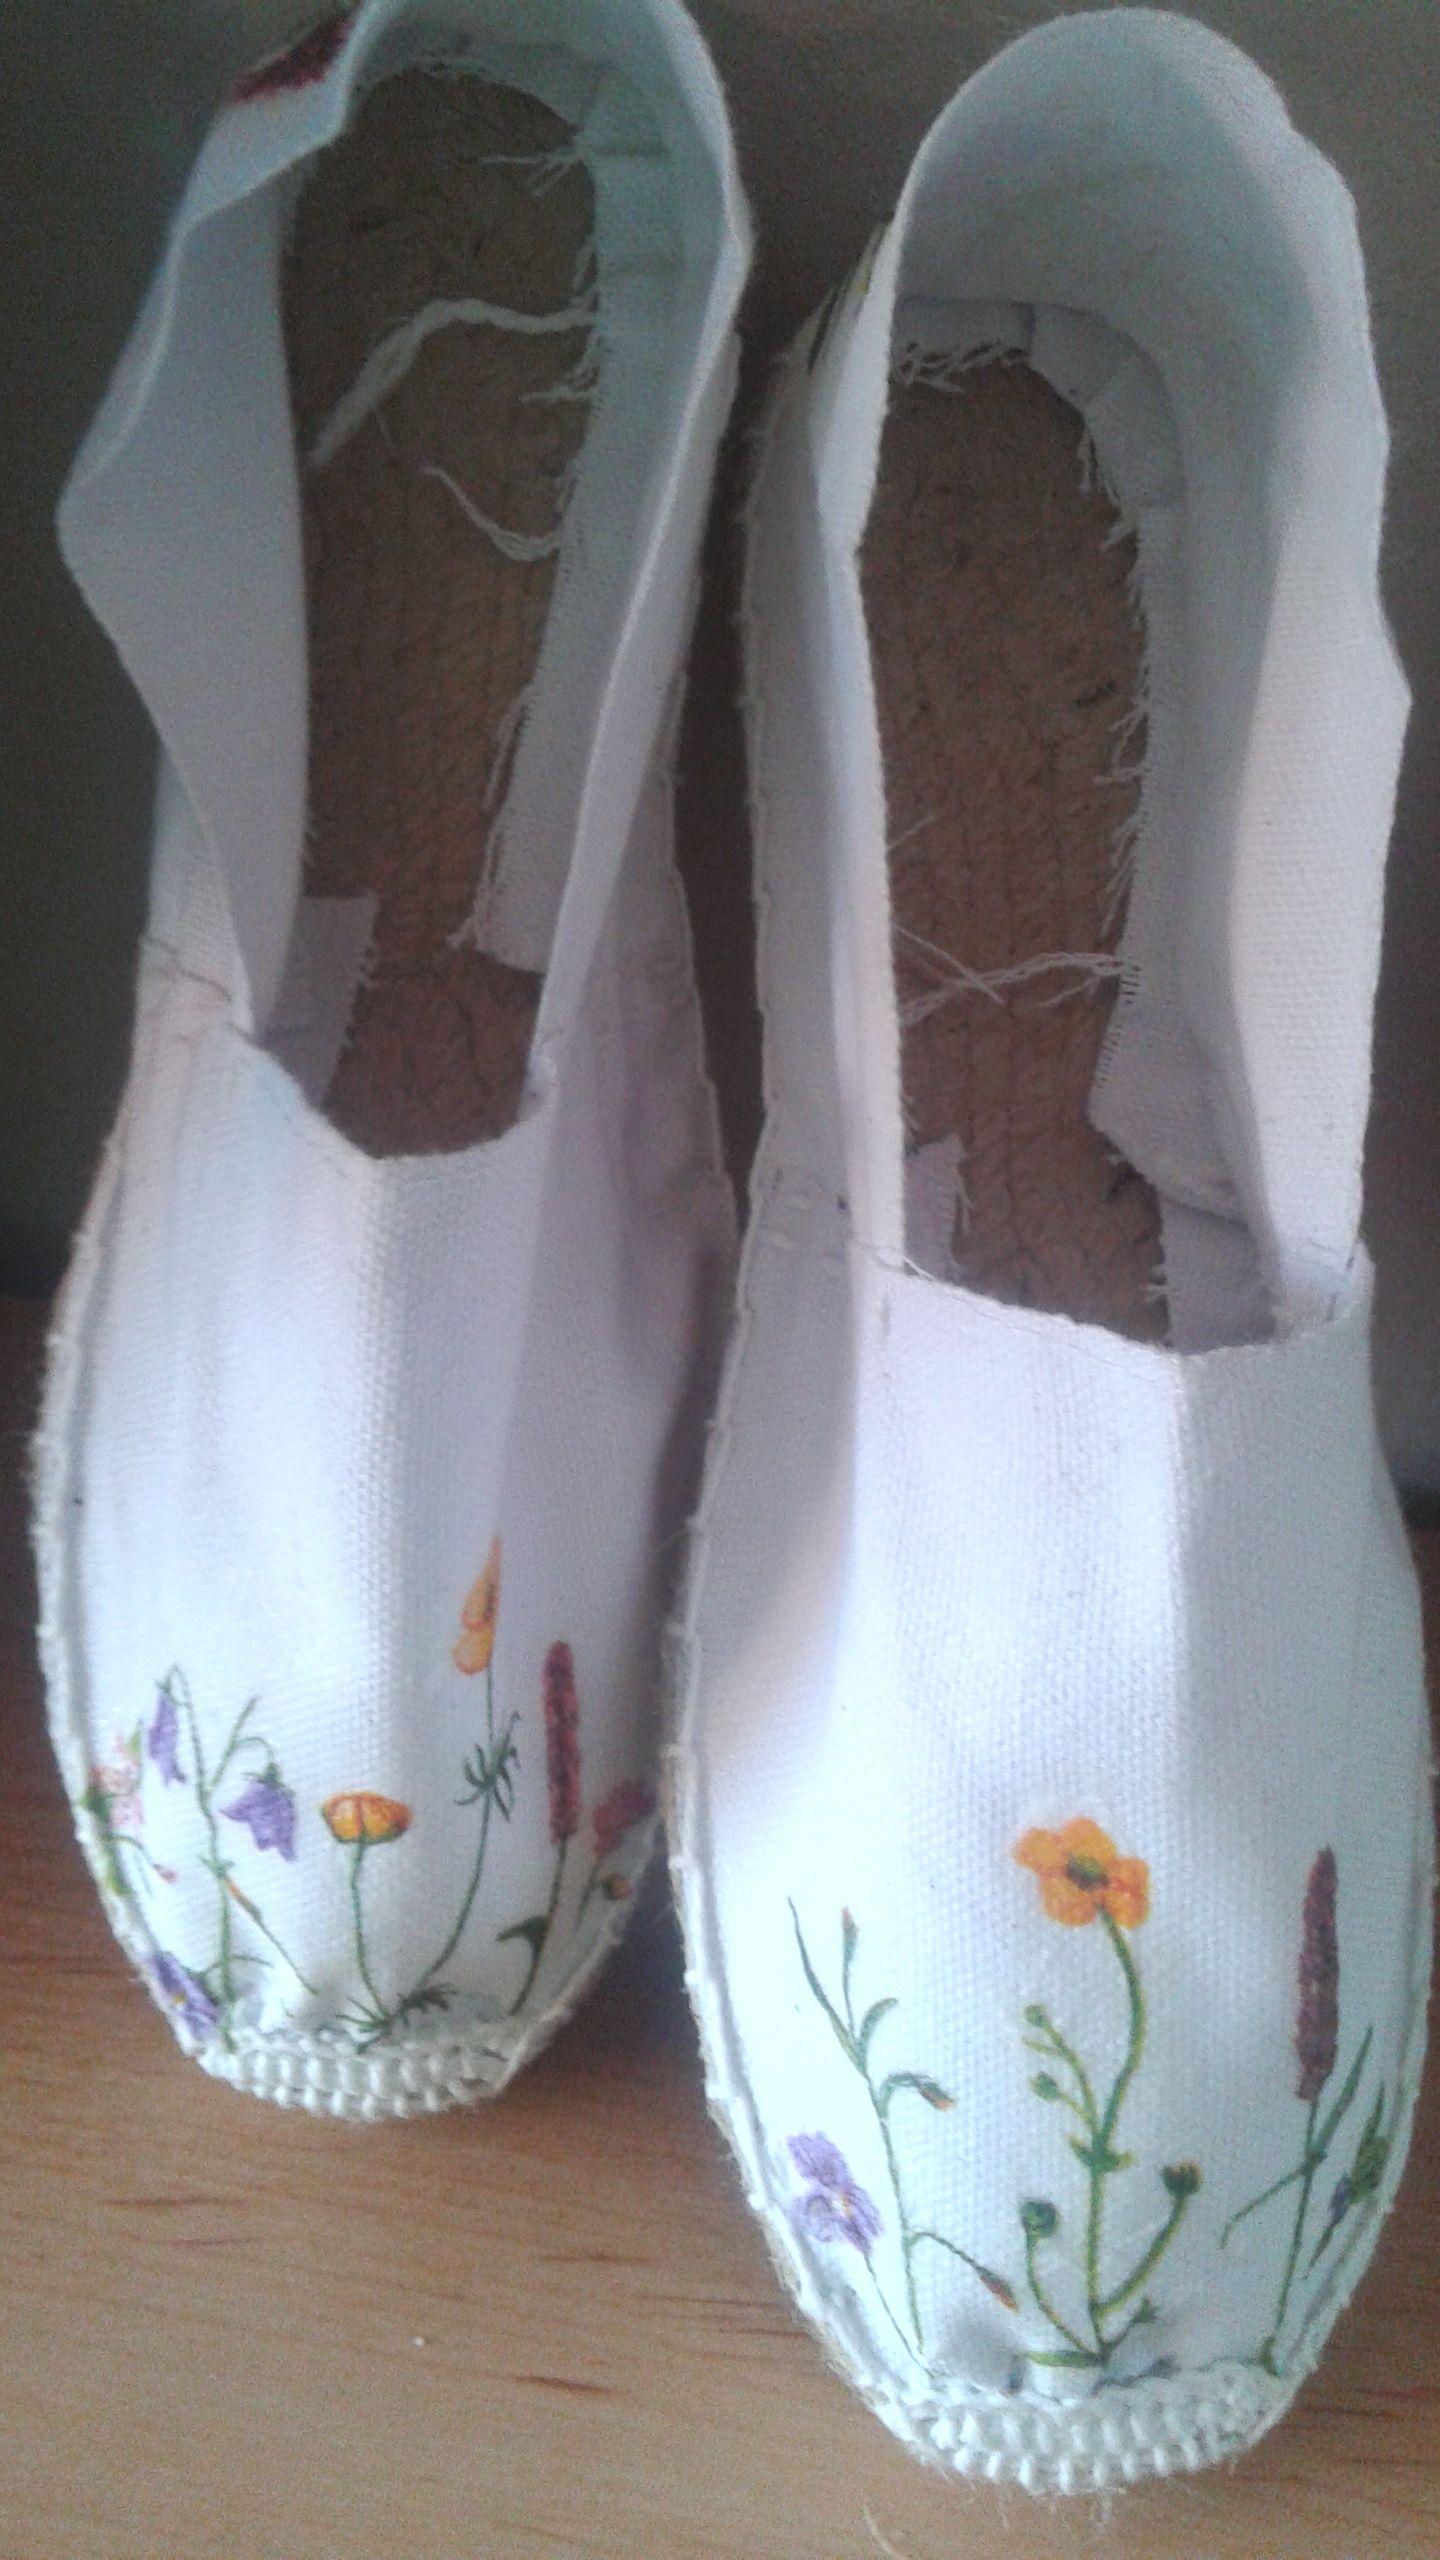 Zapatillas de esparto decoradas alpargatas pinterest zapatillas alpargatas y zapatillas - Alpargatas de esparto ...